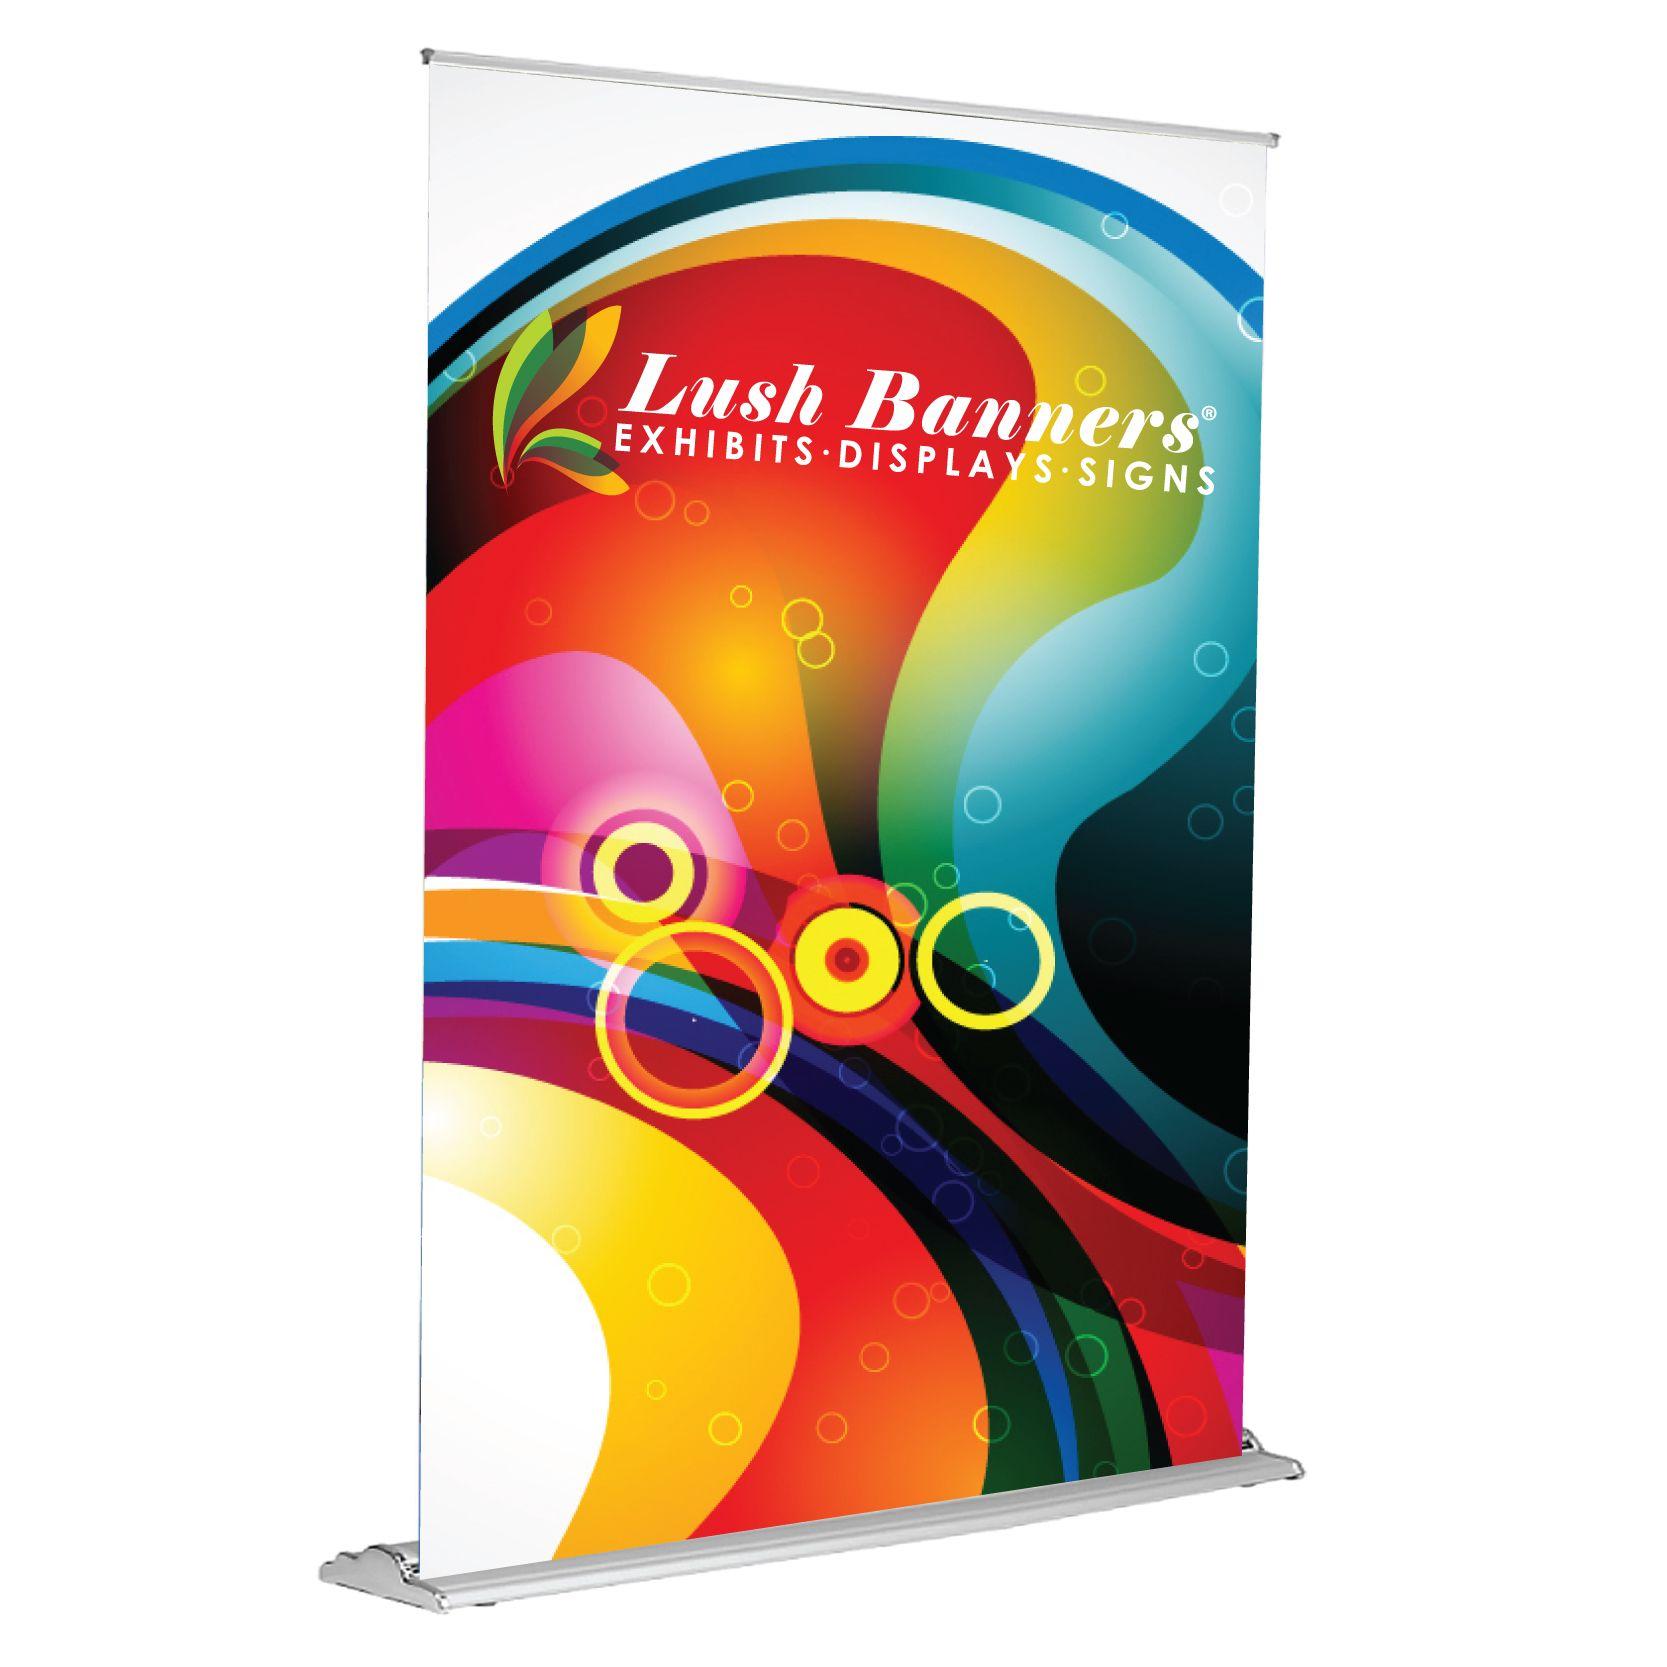 Silverstep Retractable Backdrop (Premium 60 Inches)